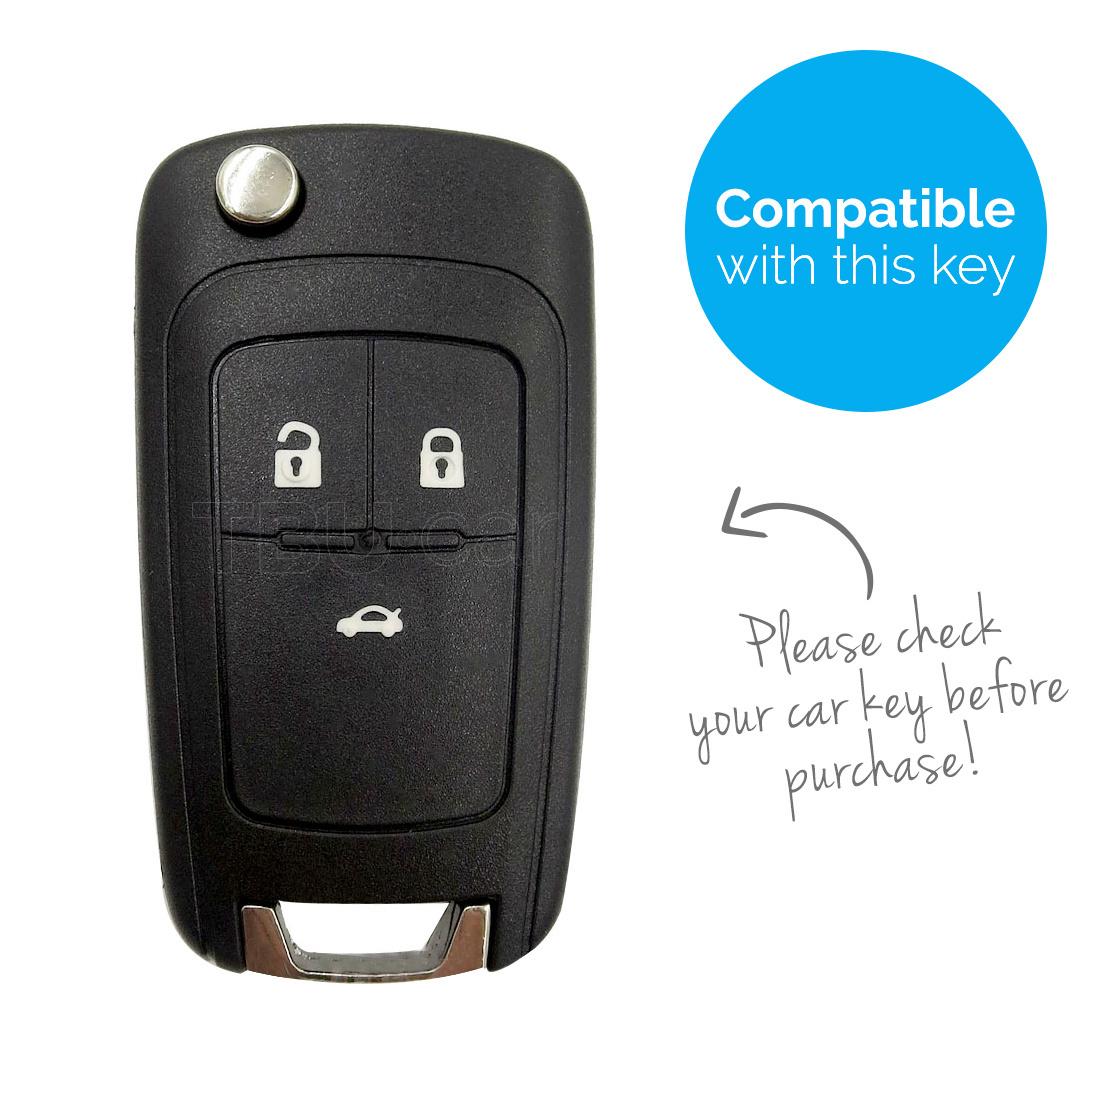 TBU car TBU car Sleutel cover compatibel met Vauxhall - TPU sleutel hoesje / beschermhoesje autosleutel - Chrome